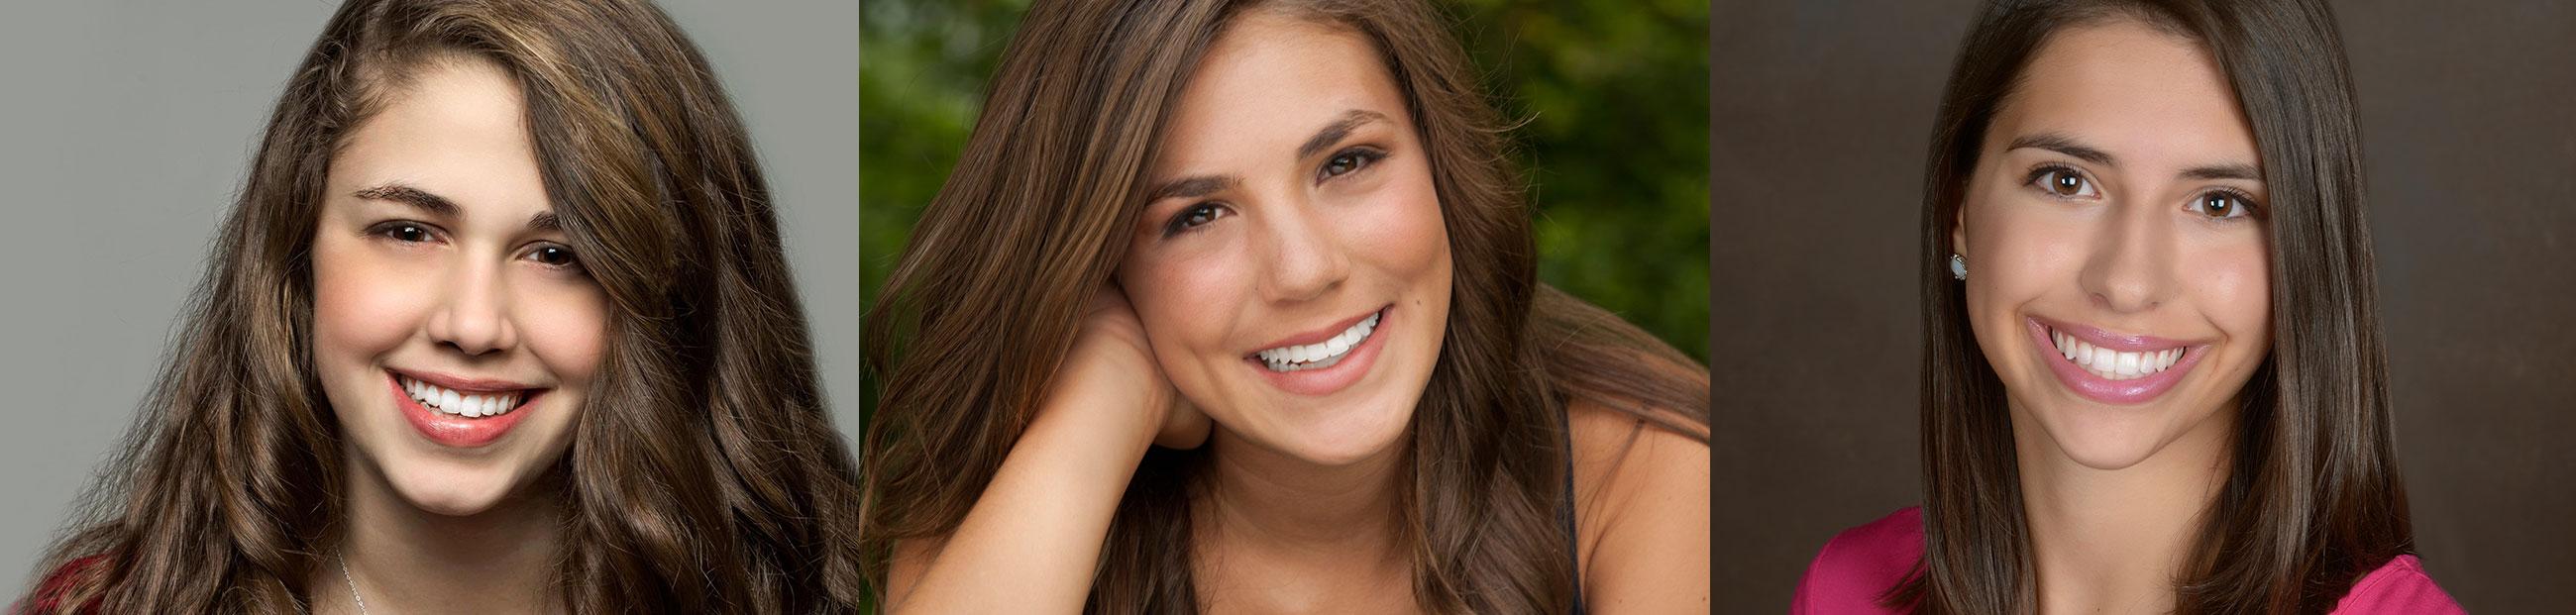 Why orthodontics matters